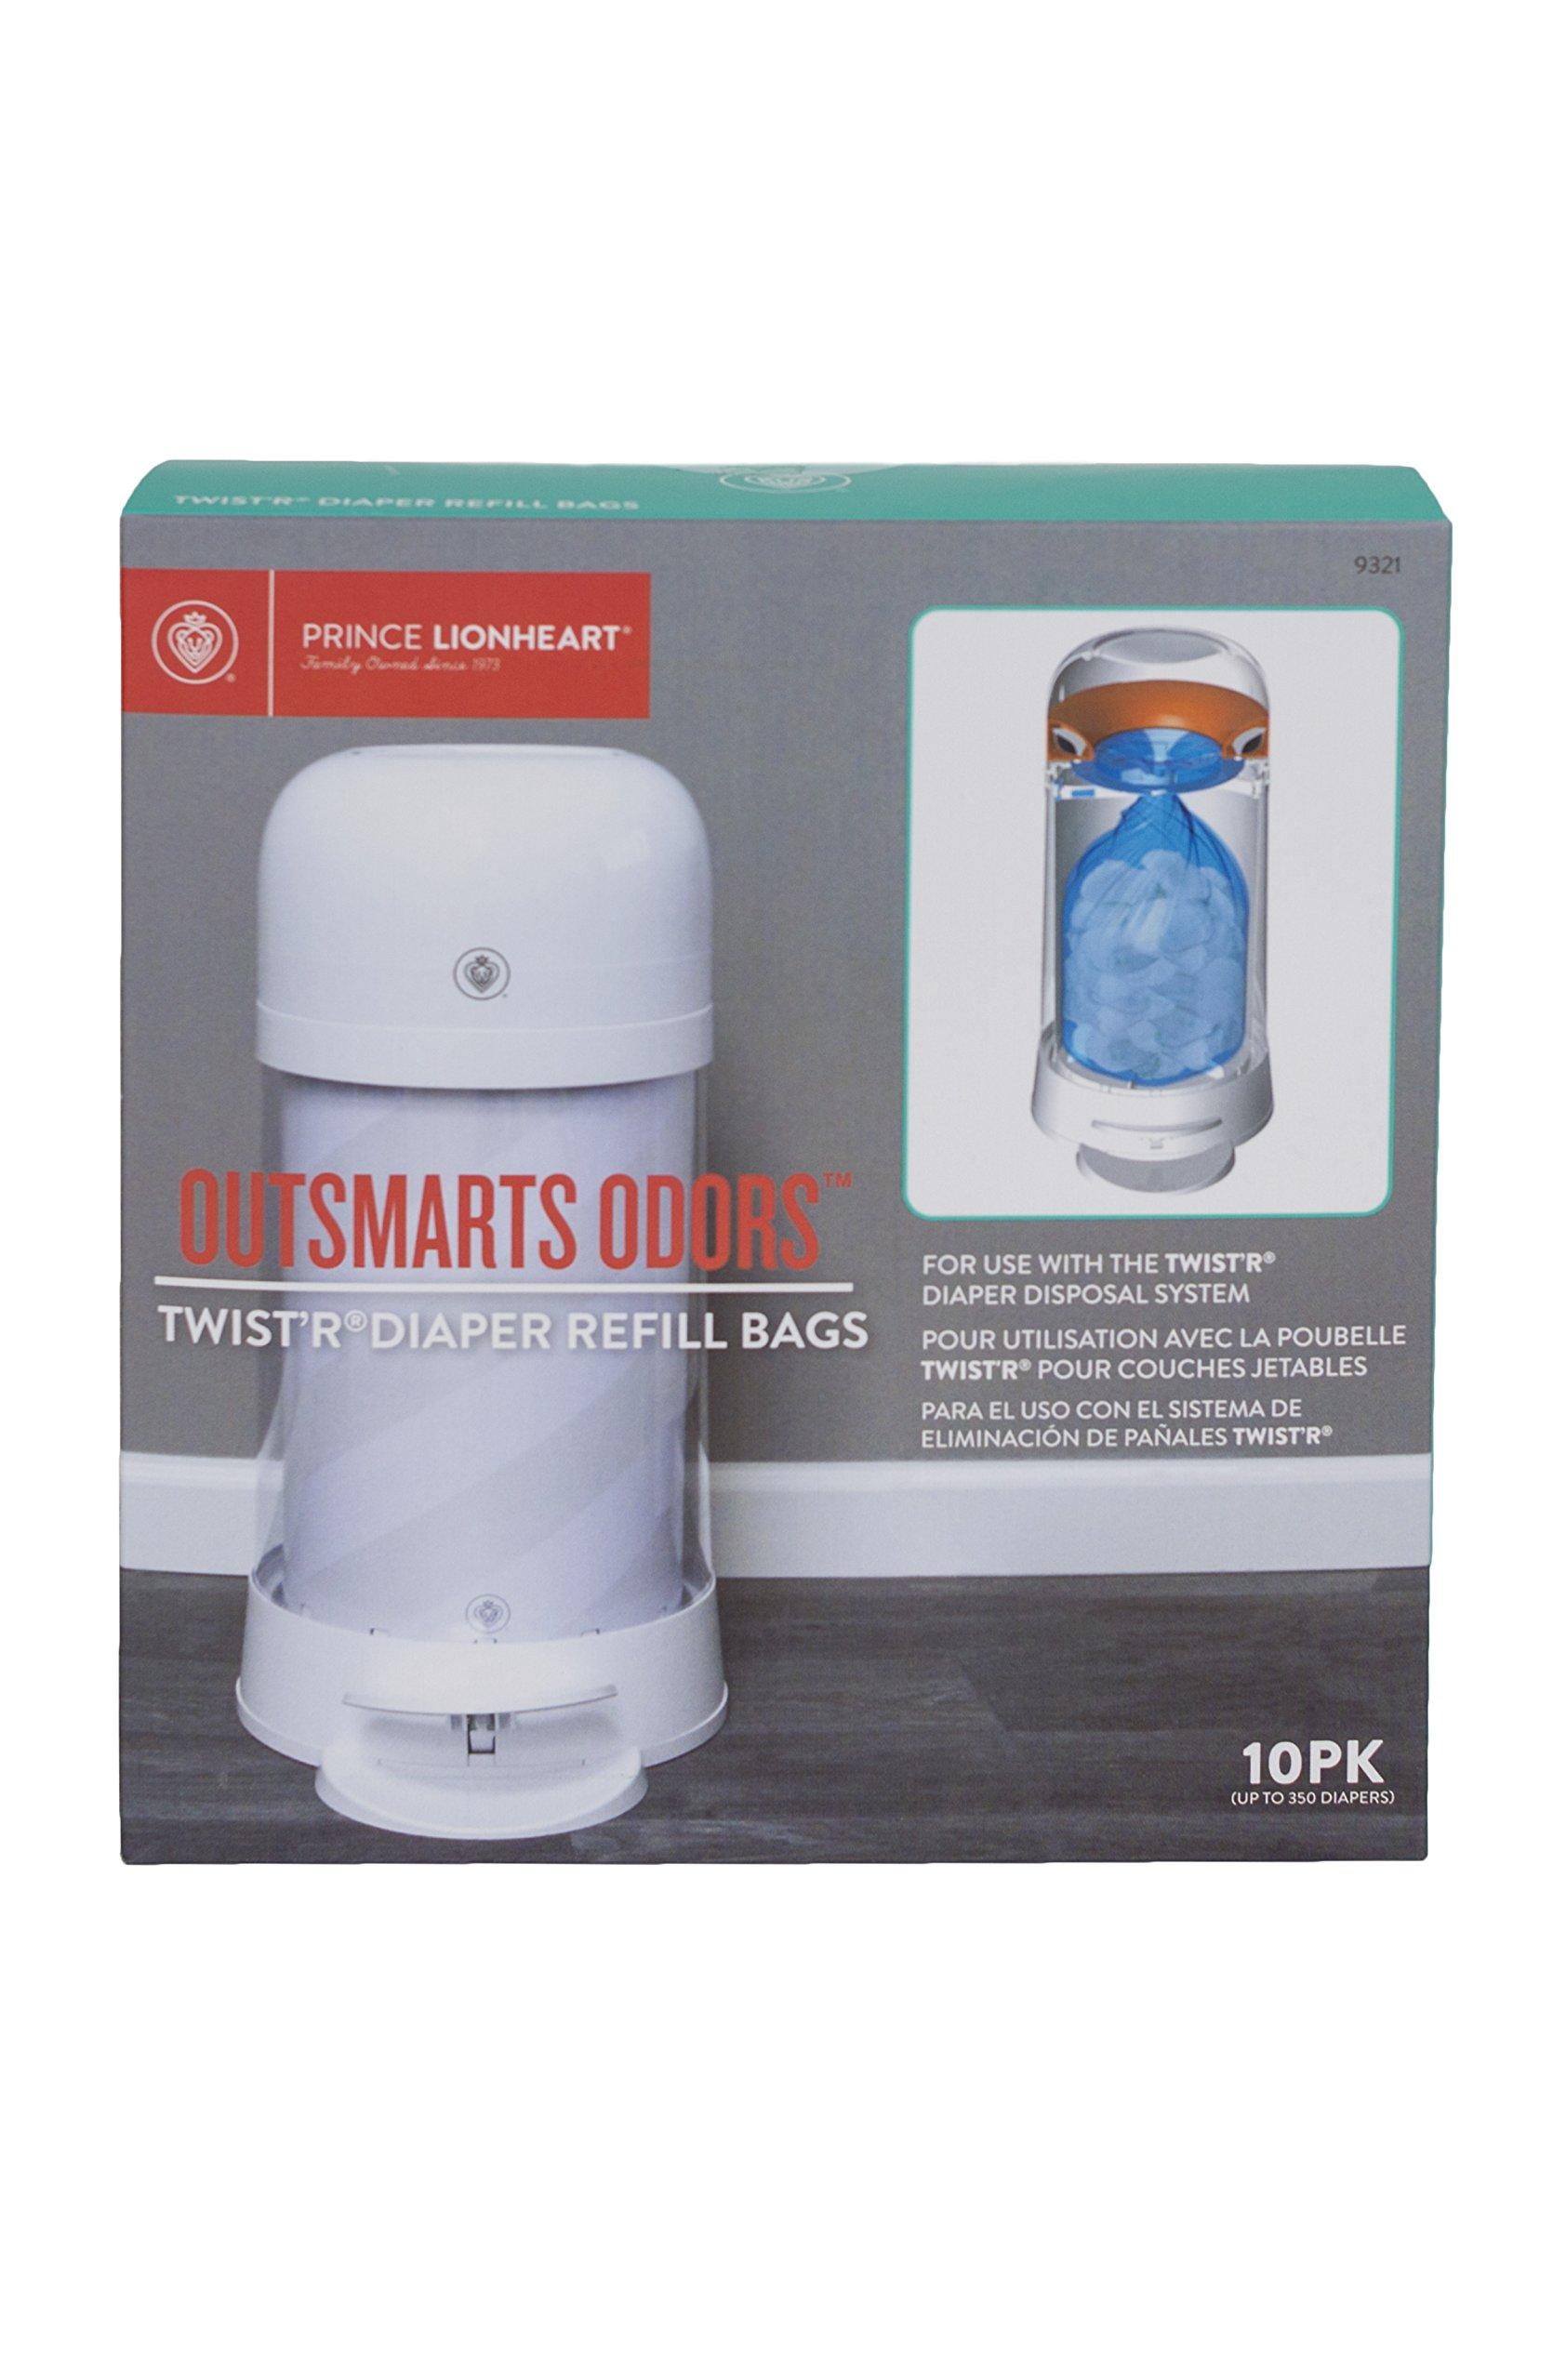 Prince Lionheart Twist'R Diaper Refill Bags-20pk